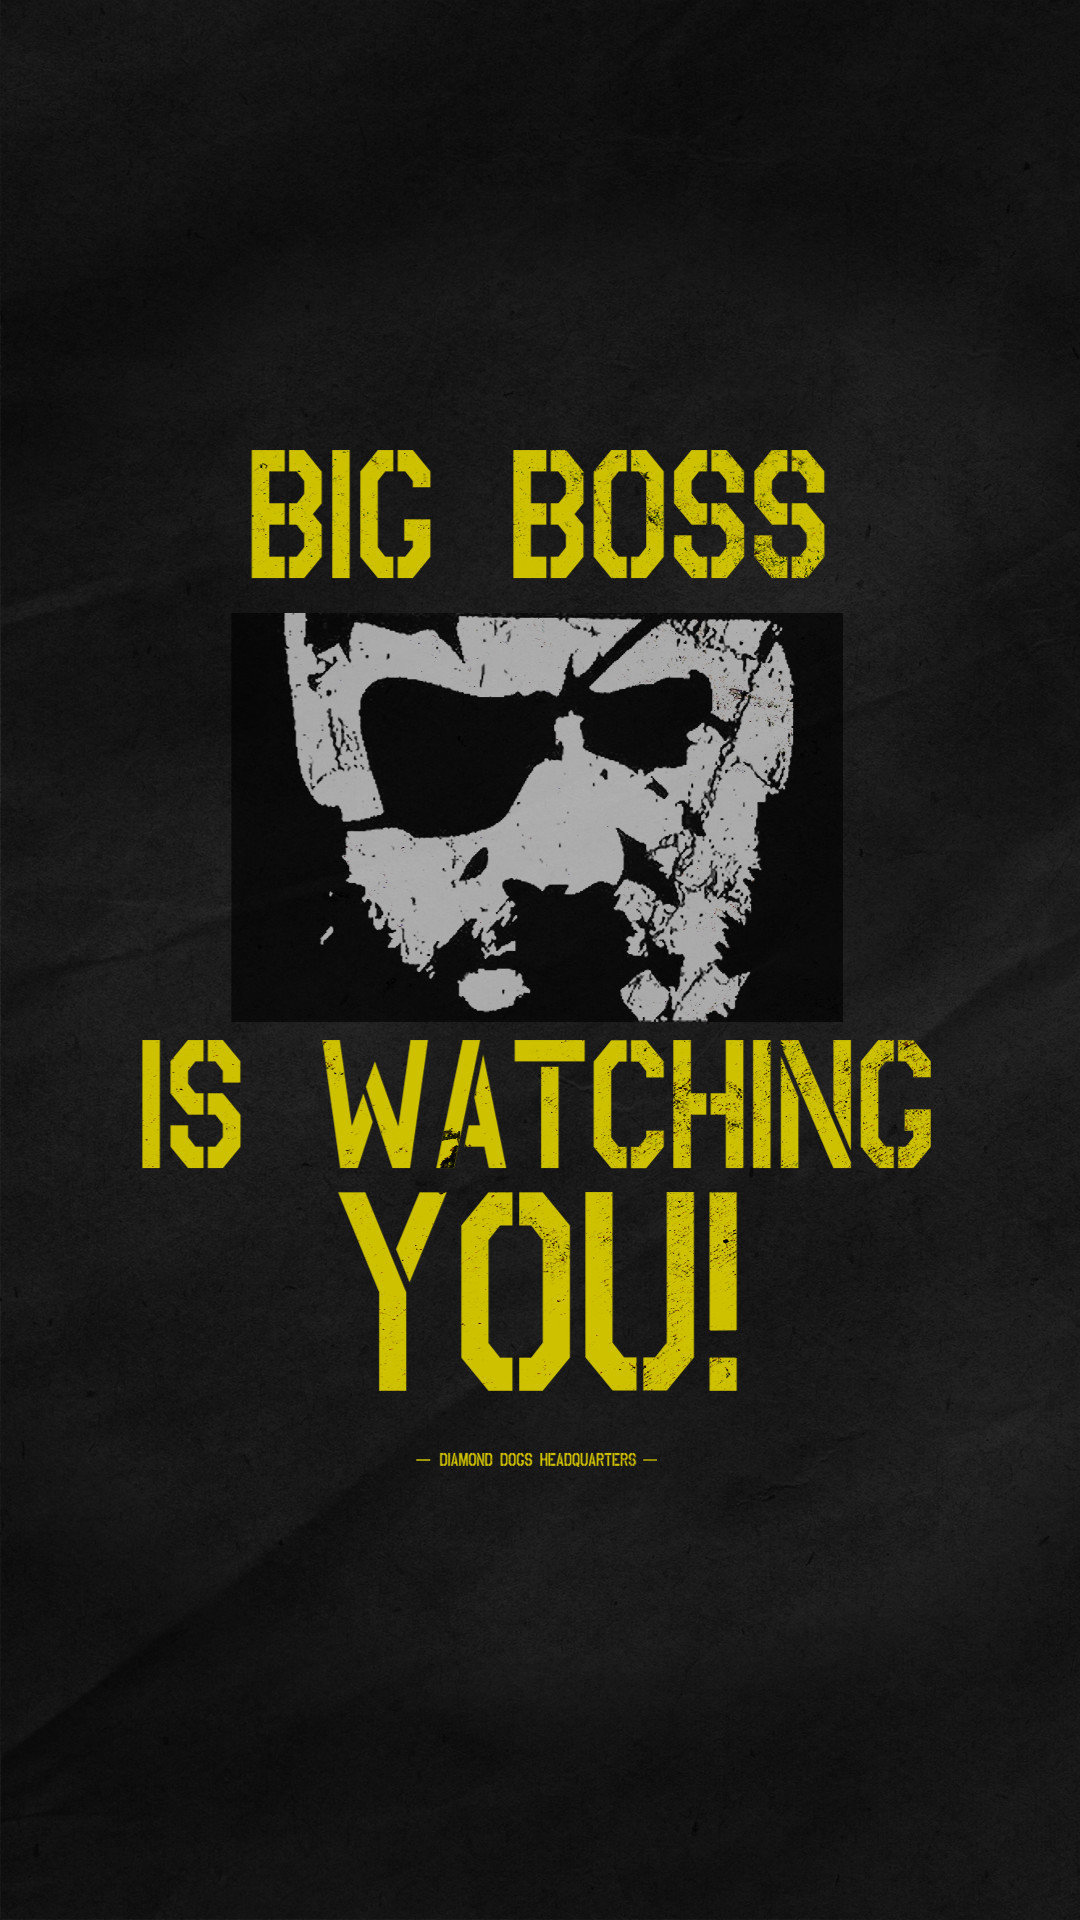 Póster de Big Boss Metal Gear Solid V The Phantom Pain #MGSV #MGSVTPP #